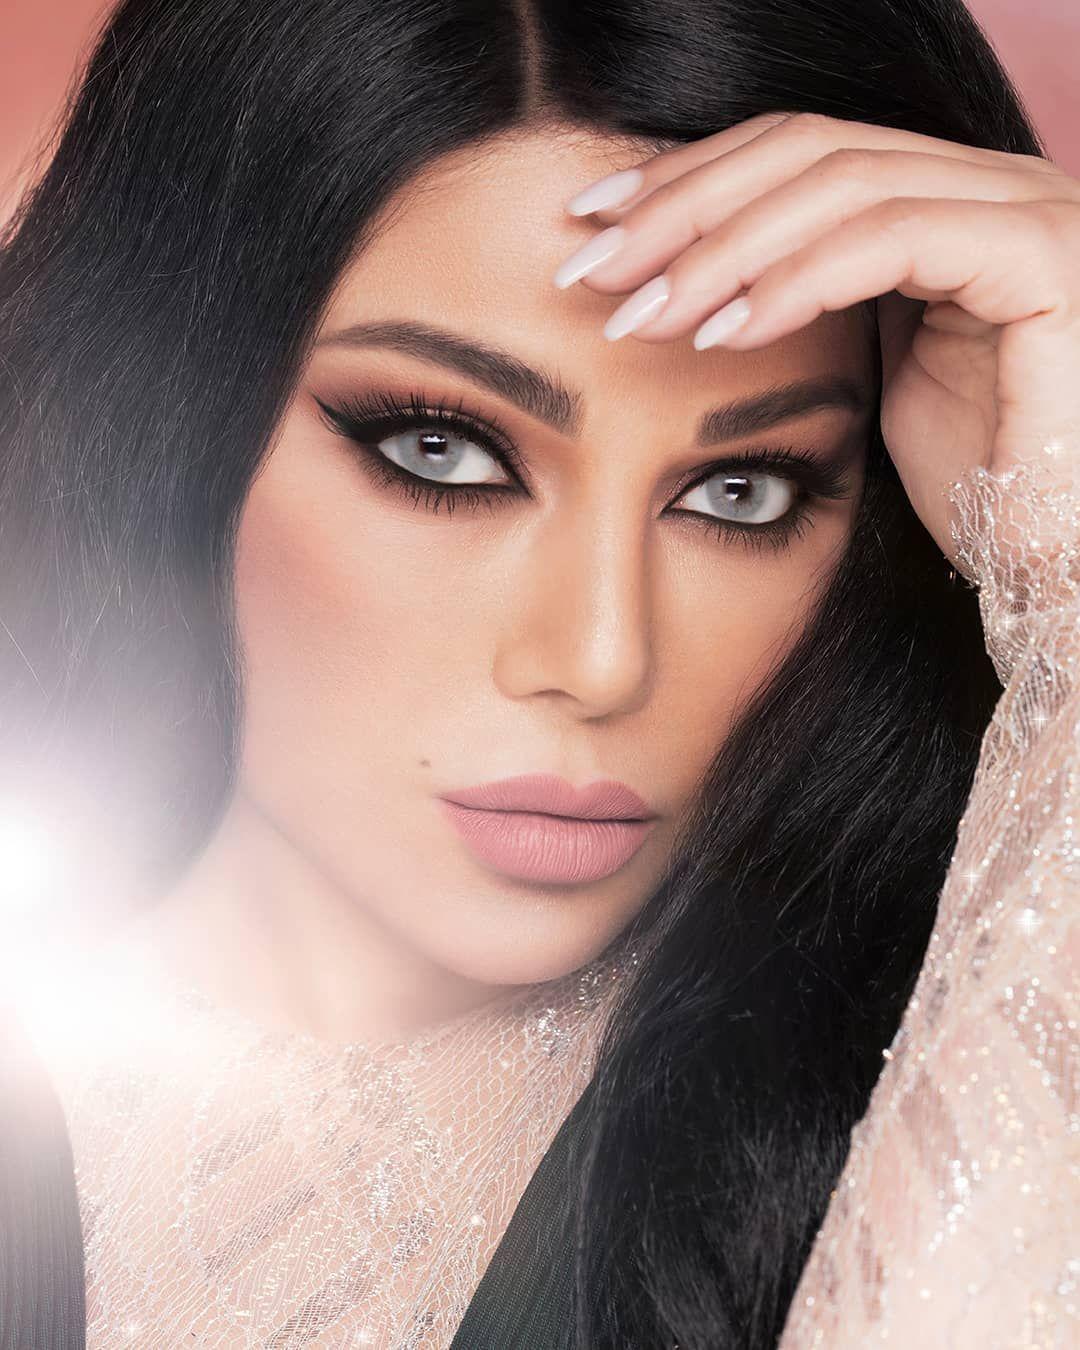 Haifa Wehbe in her last photo session